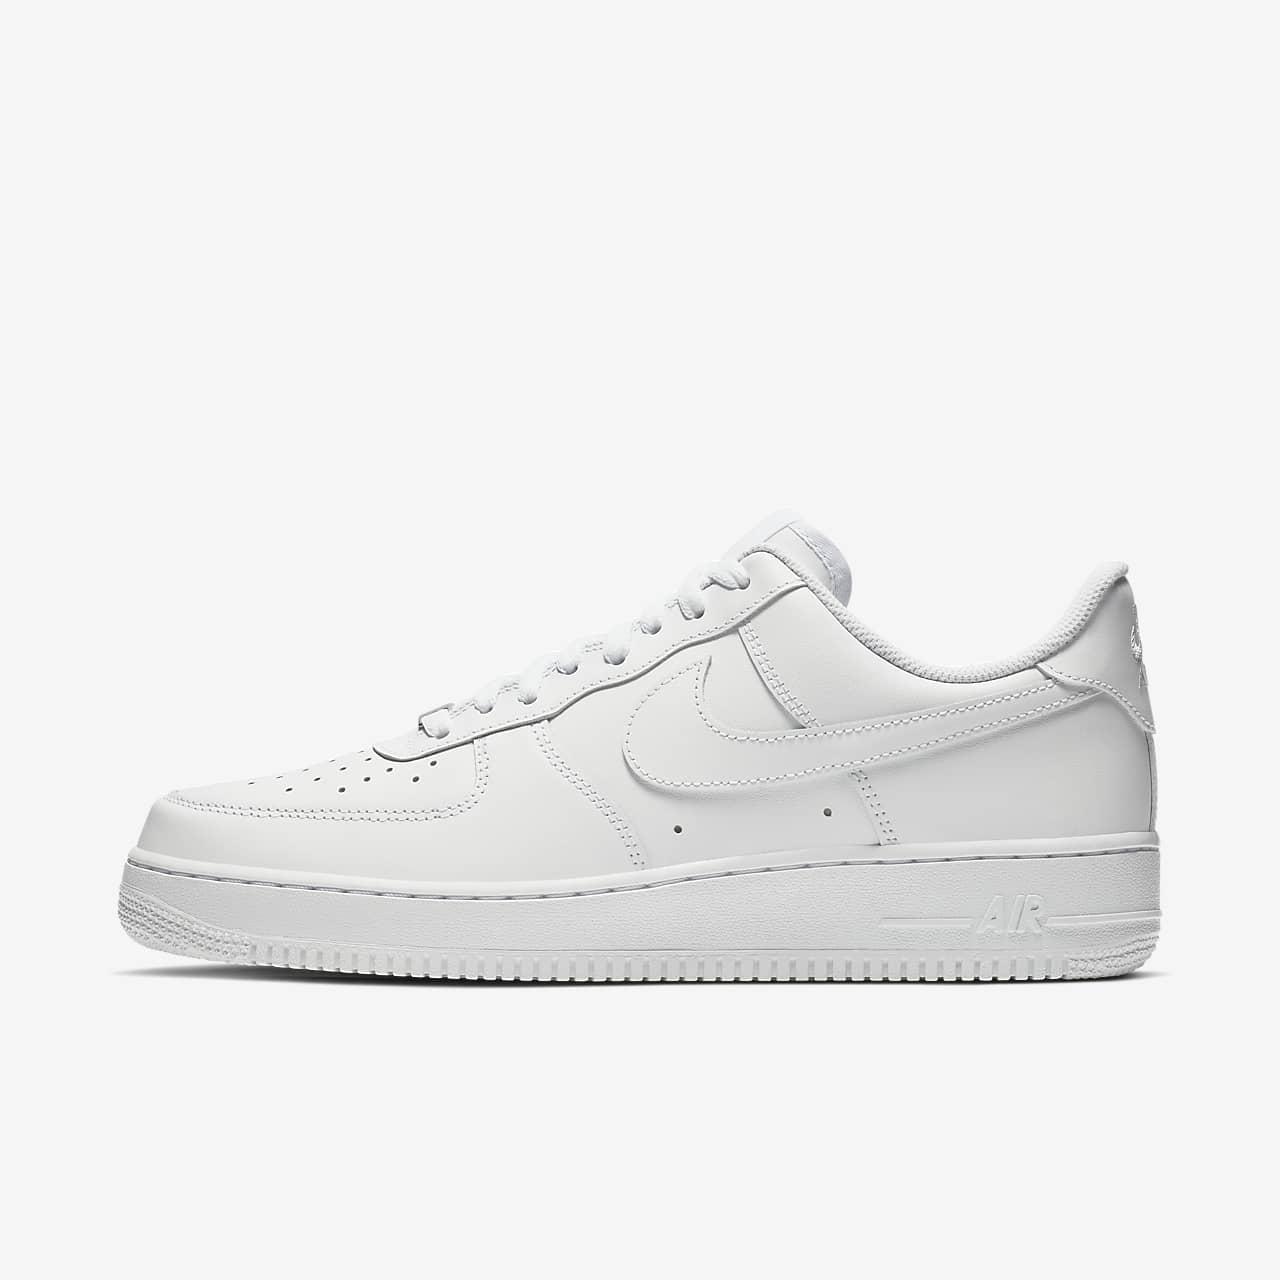 Nike Air Force 1 '07 男子运动鞋